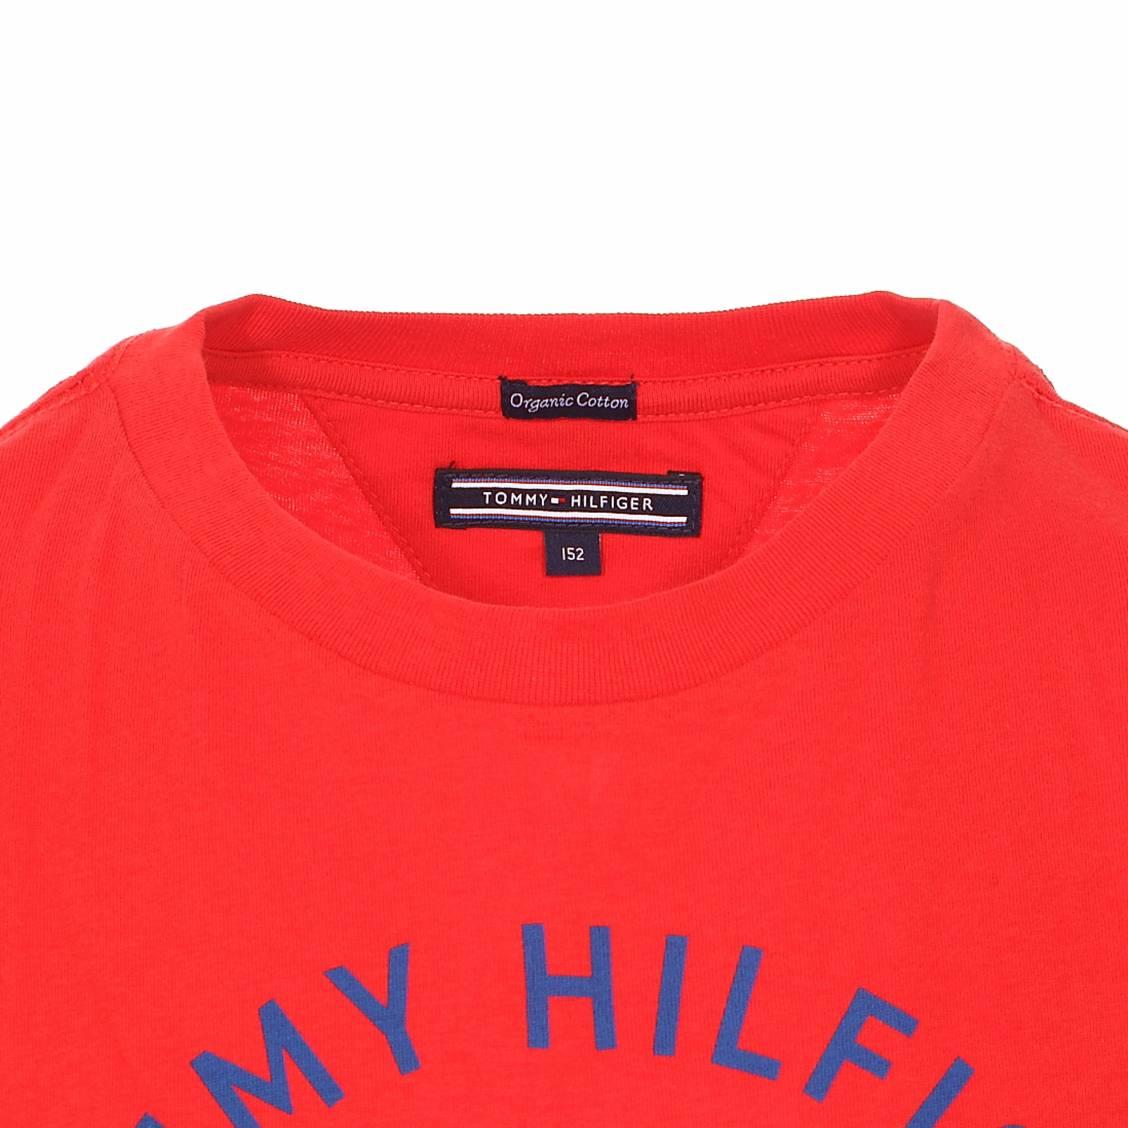 bbdd41fe ... Tee-shirt col rond Tommy Hilfiger Junior Ame Bright Graphic en coton  biologique rouge floqué ...